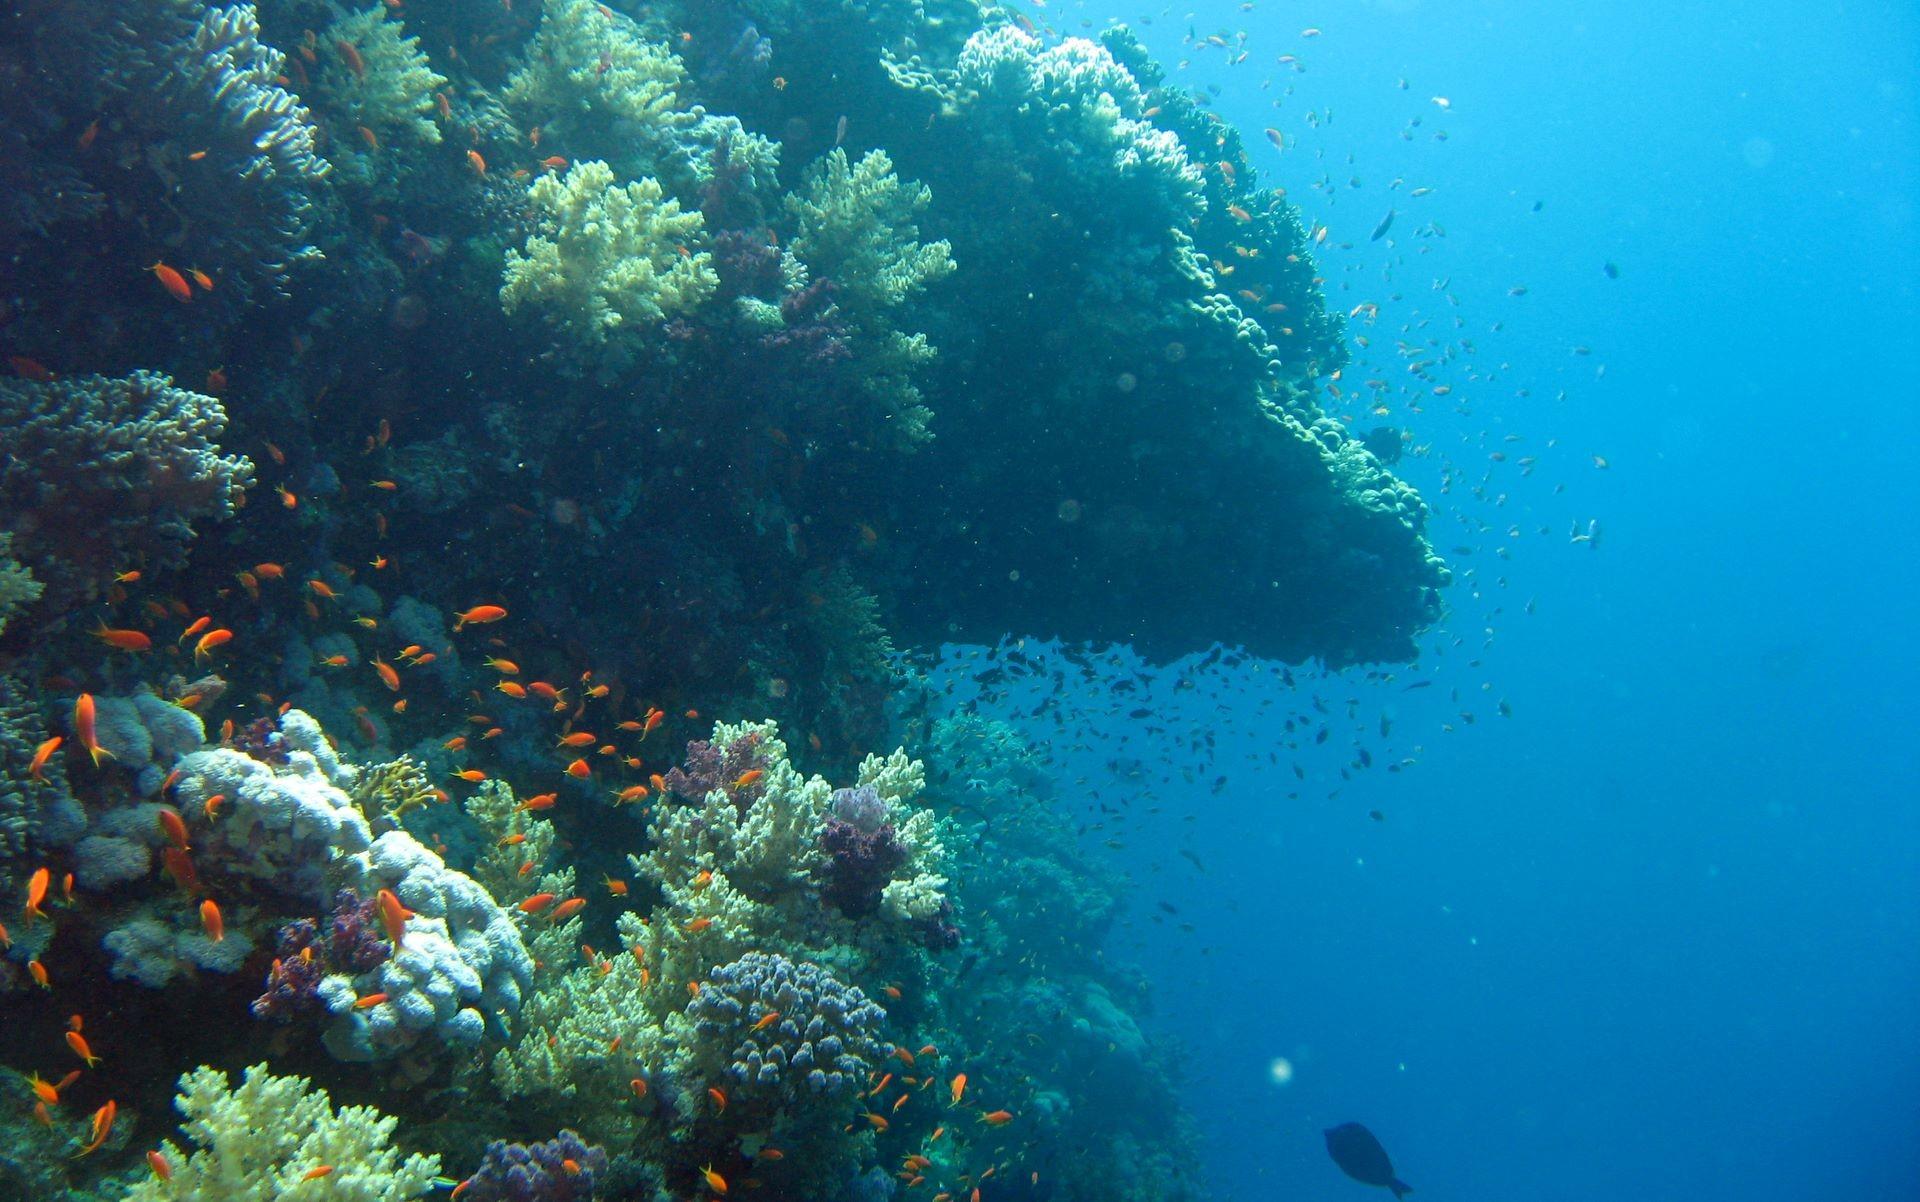 Underwater Wallpaper, ocean wallpaper, marine life on Elphinstone #8017